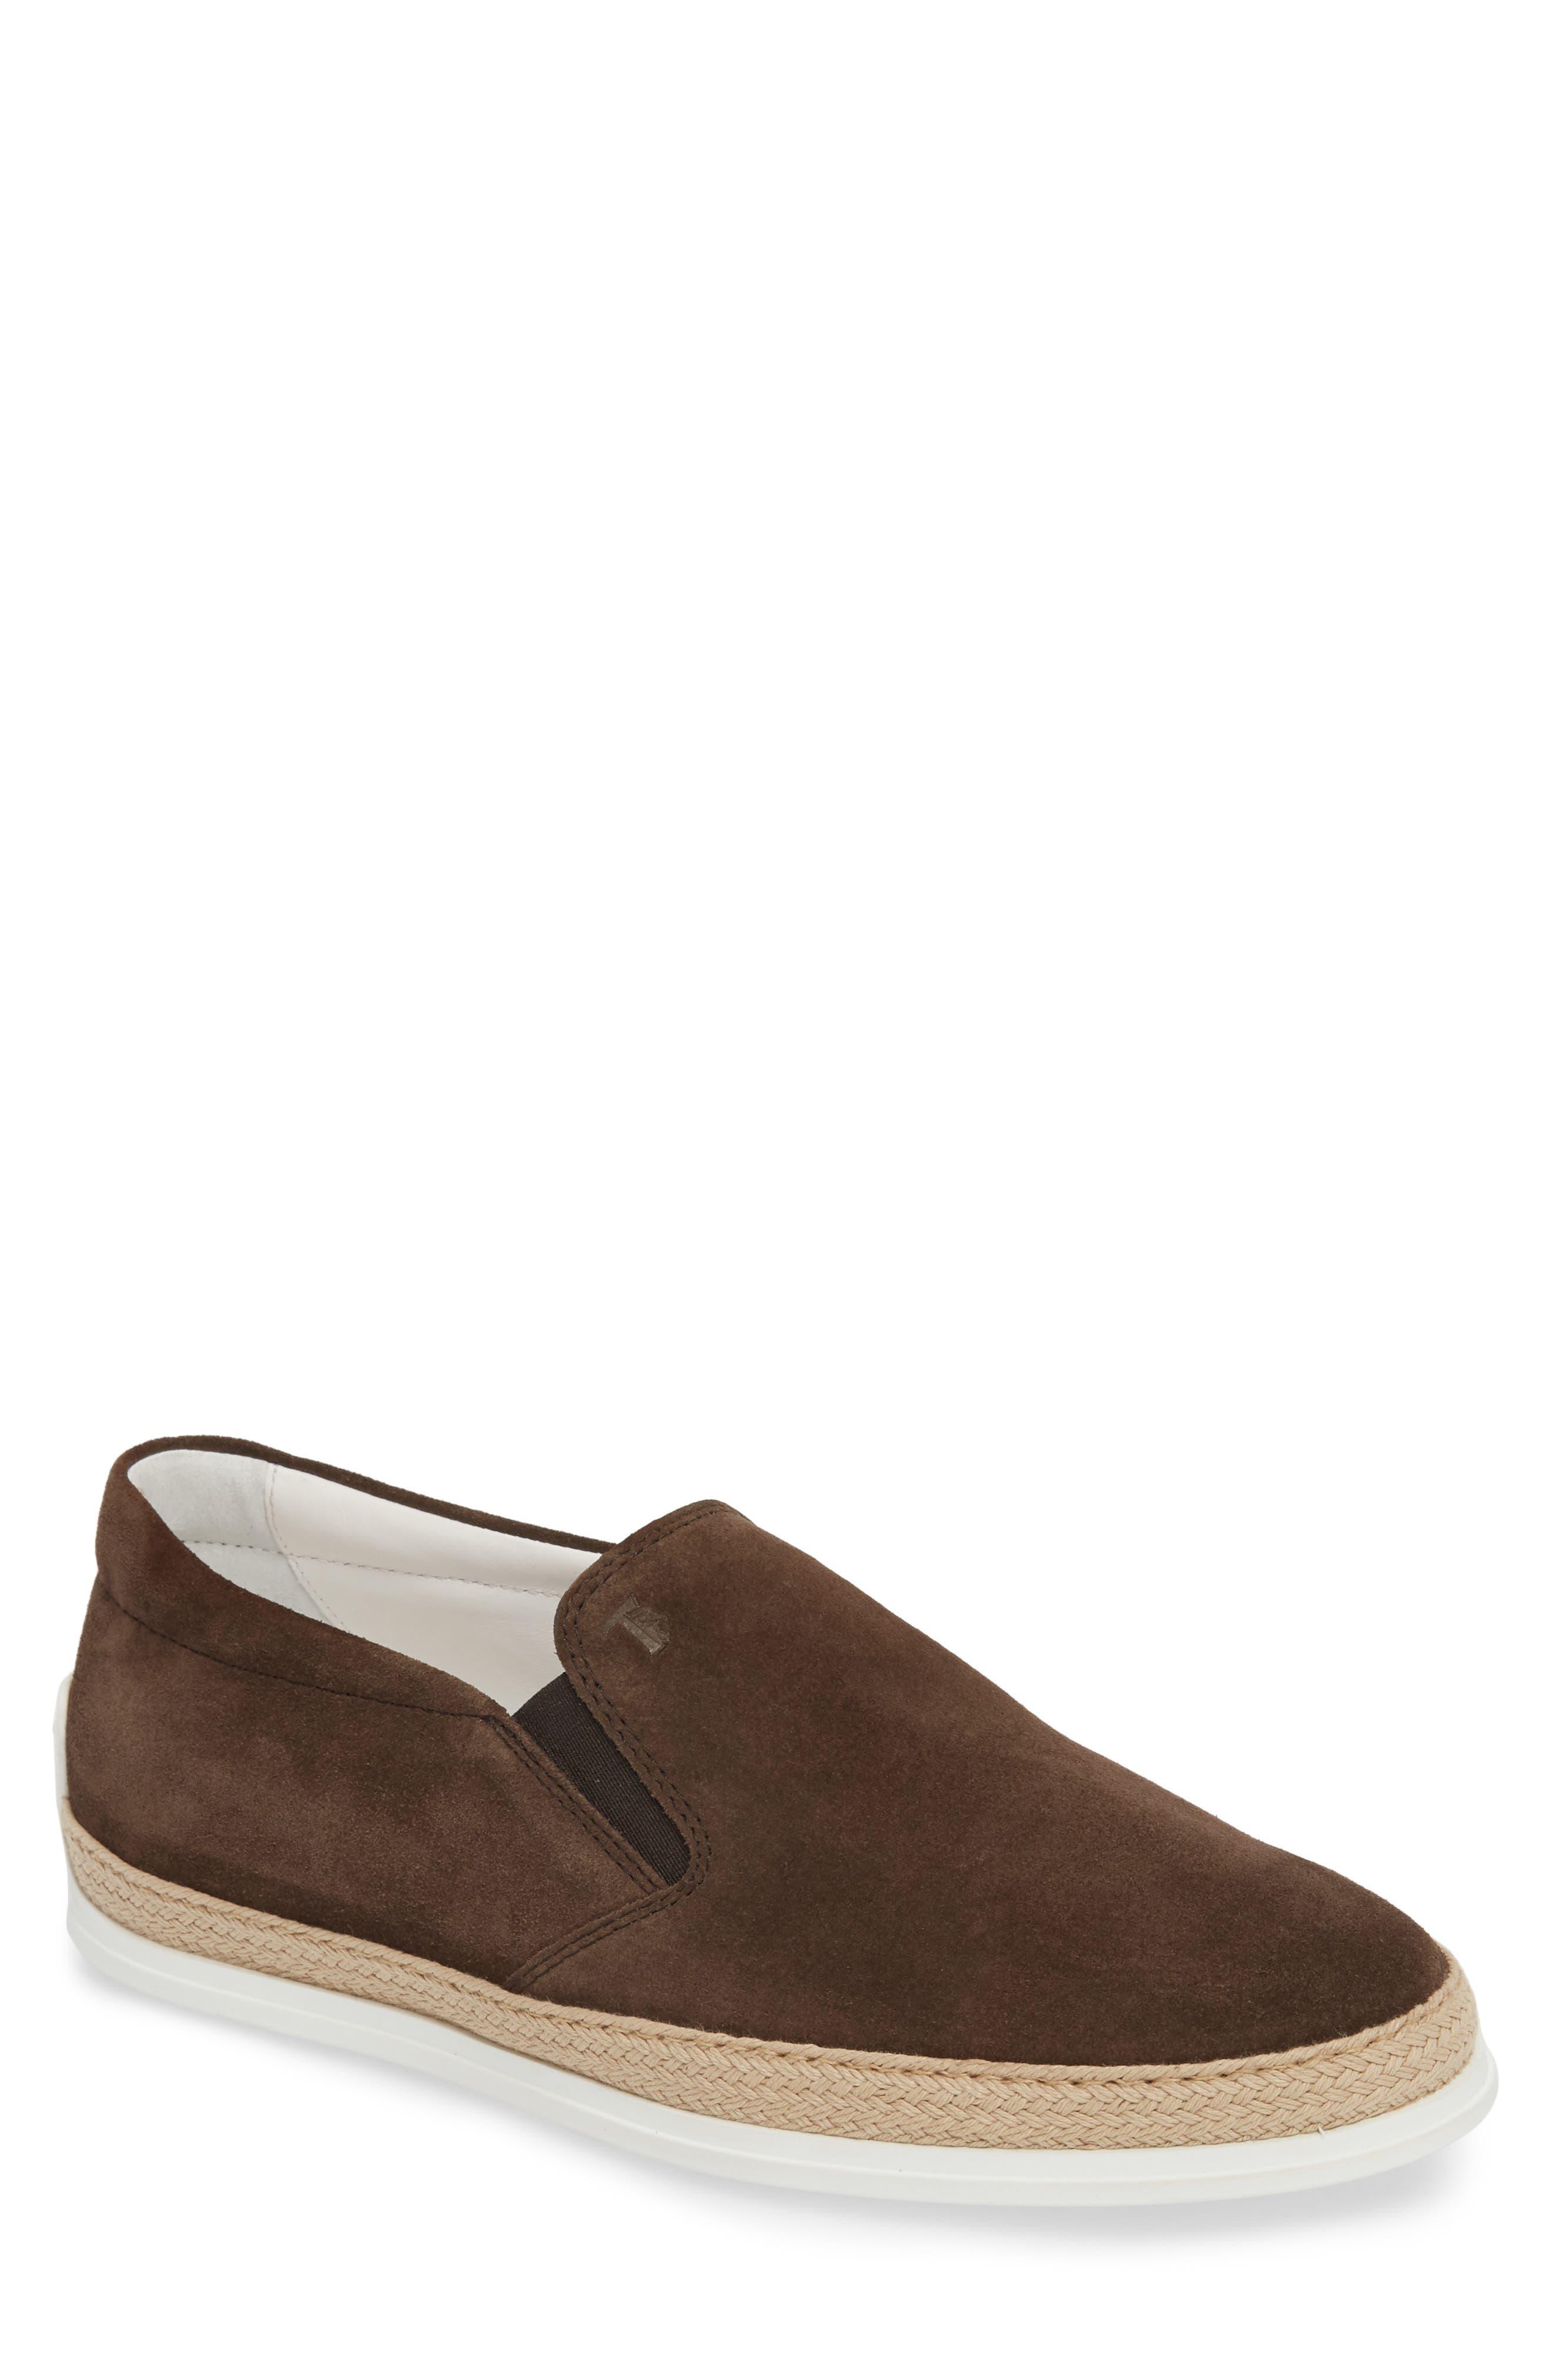 Espadrille Slip-On,                         Main,                         color, Dark Brown